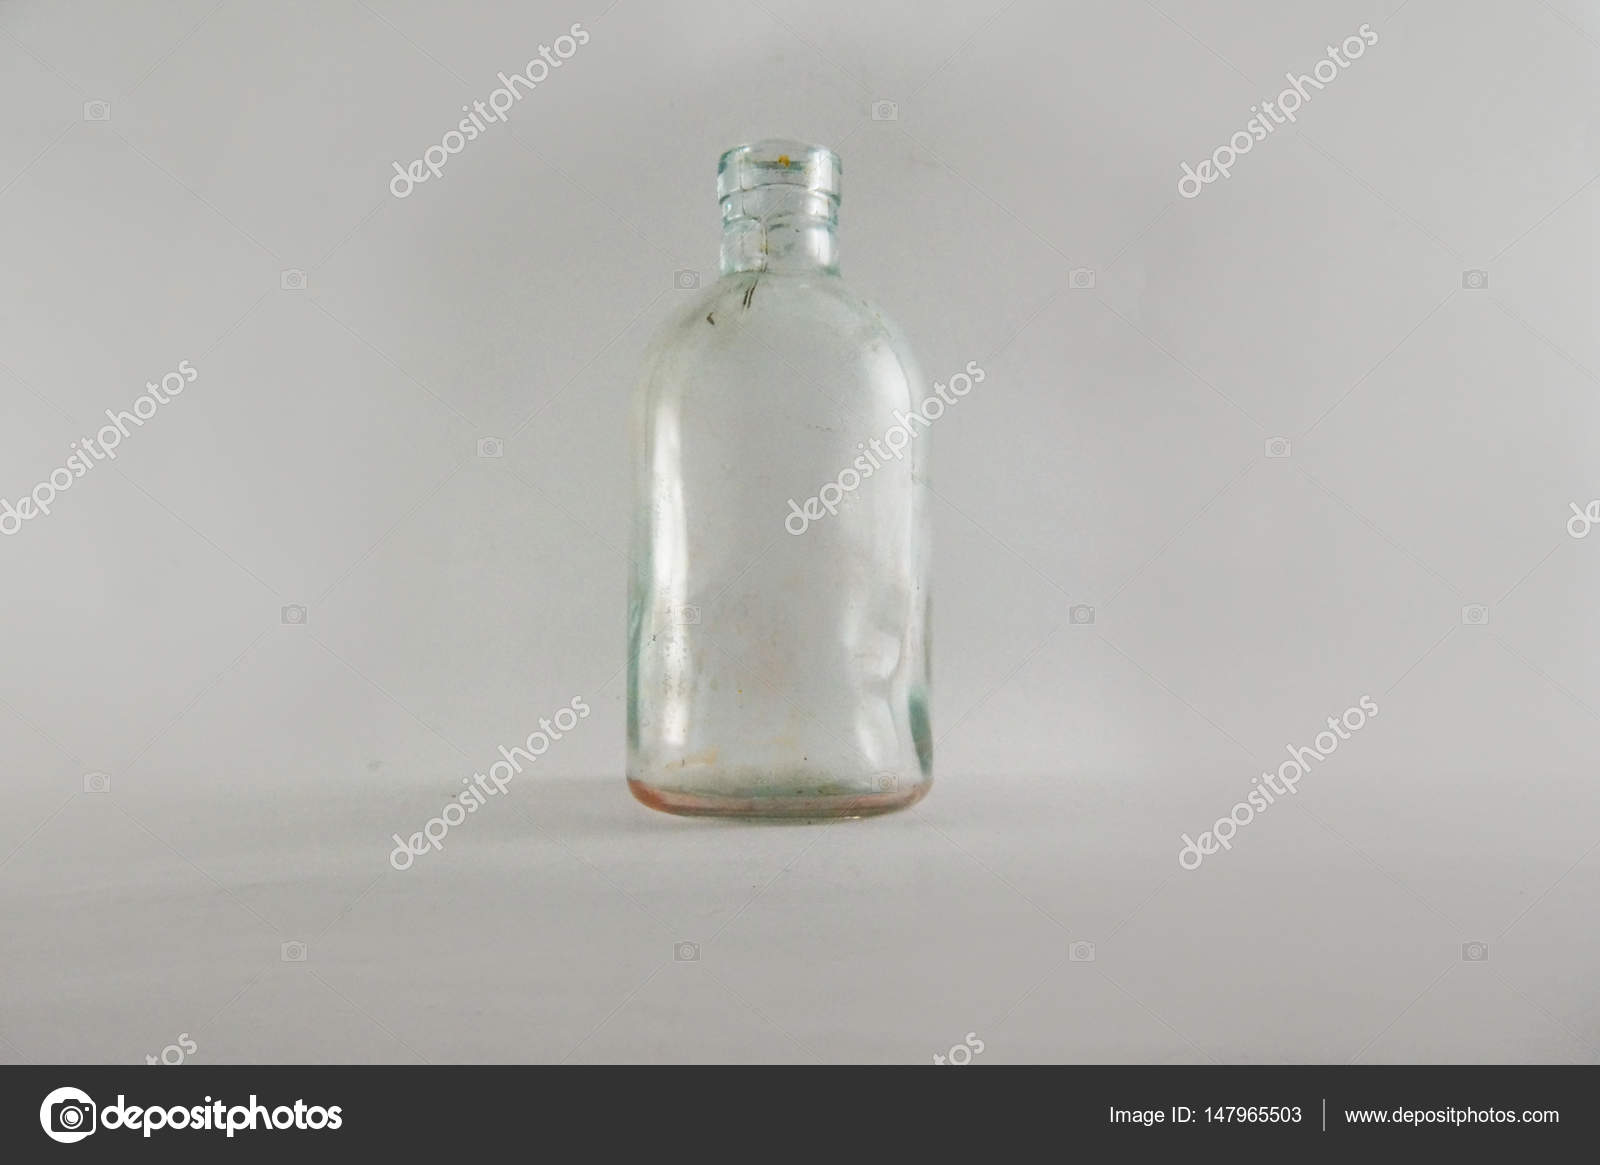 A Small Bottle Of Medicine On White Background Antique Bottles Decorative Tiny Retro Home Decor Photo By Nostalgishop